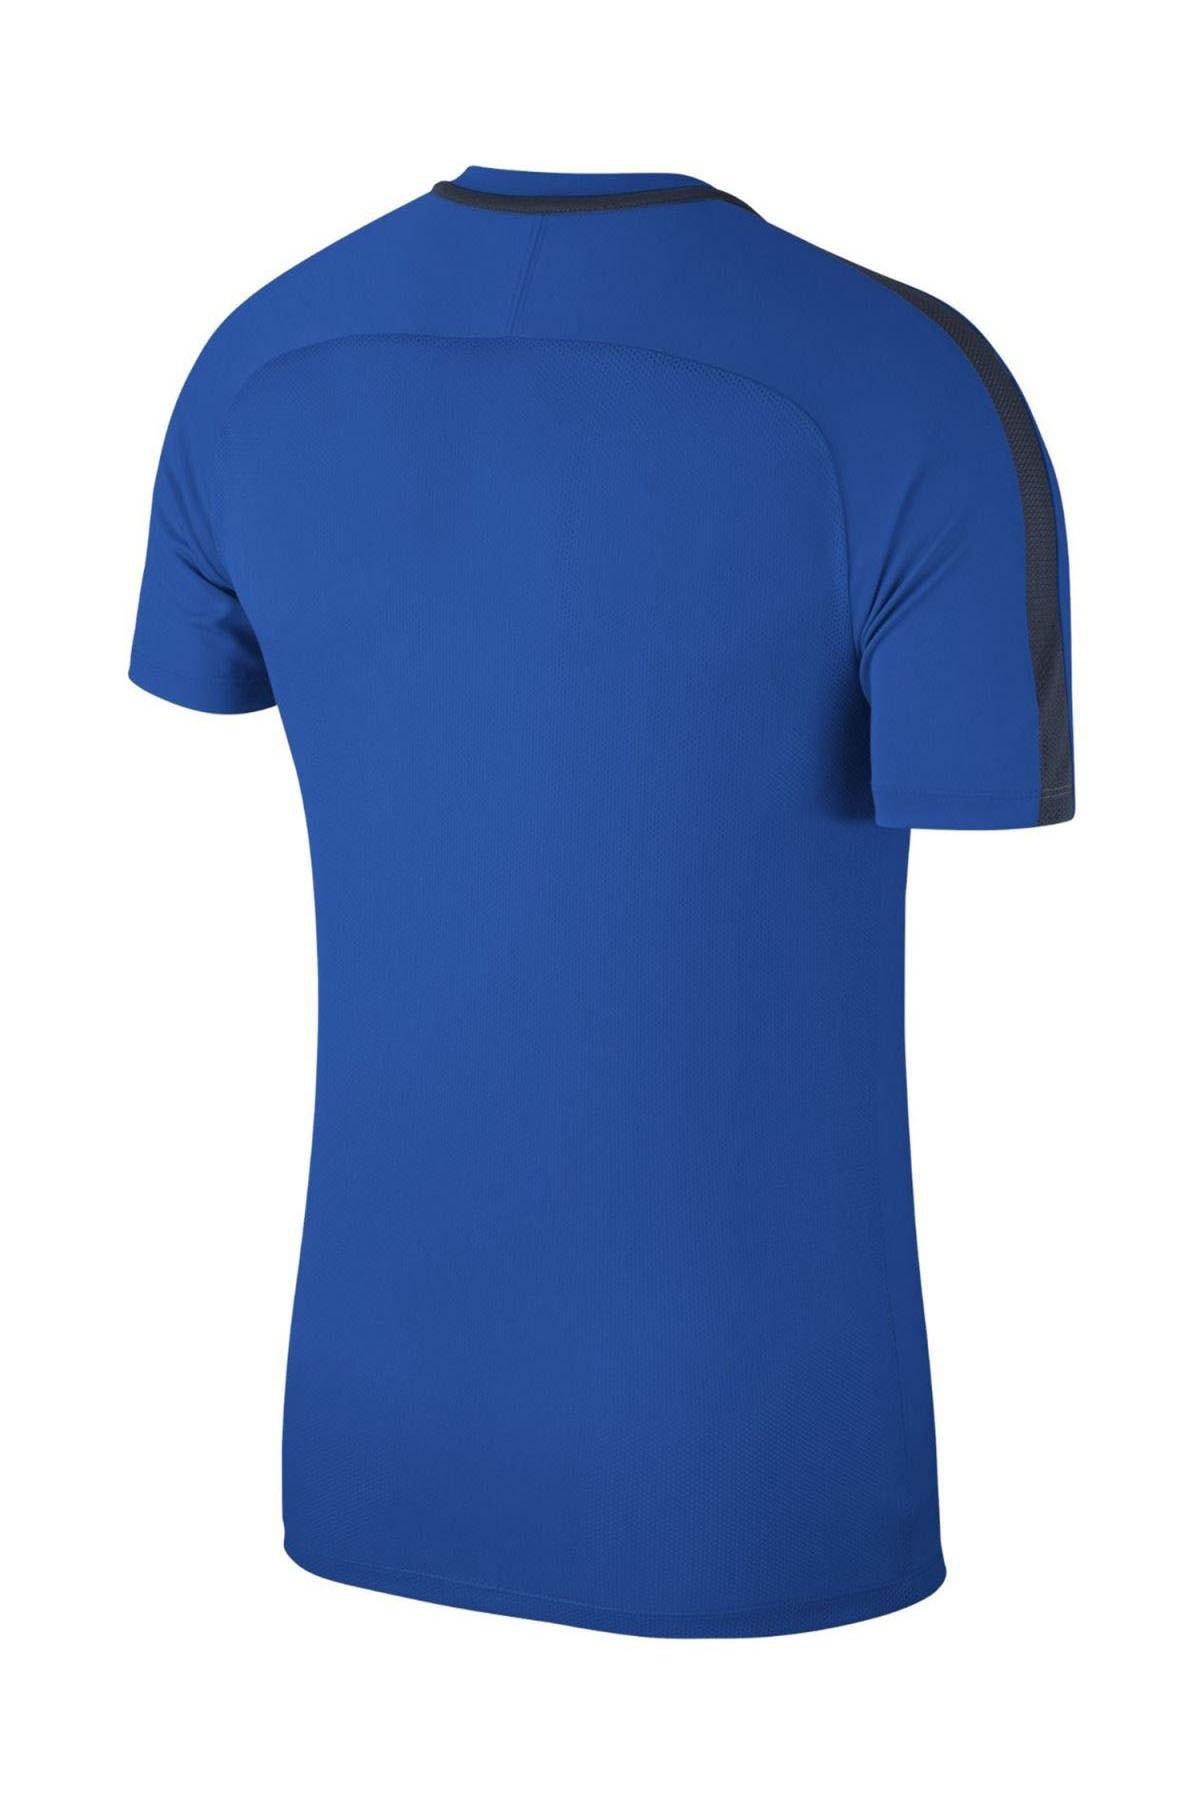 Nike Erkek T-shirt M Nk Dry Acdmy18 Top Ss 893693-463 2